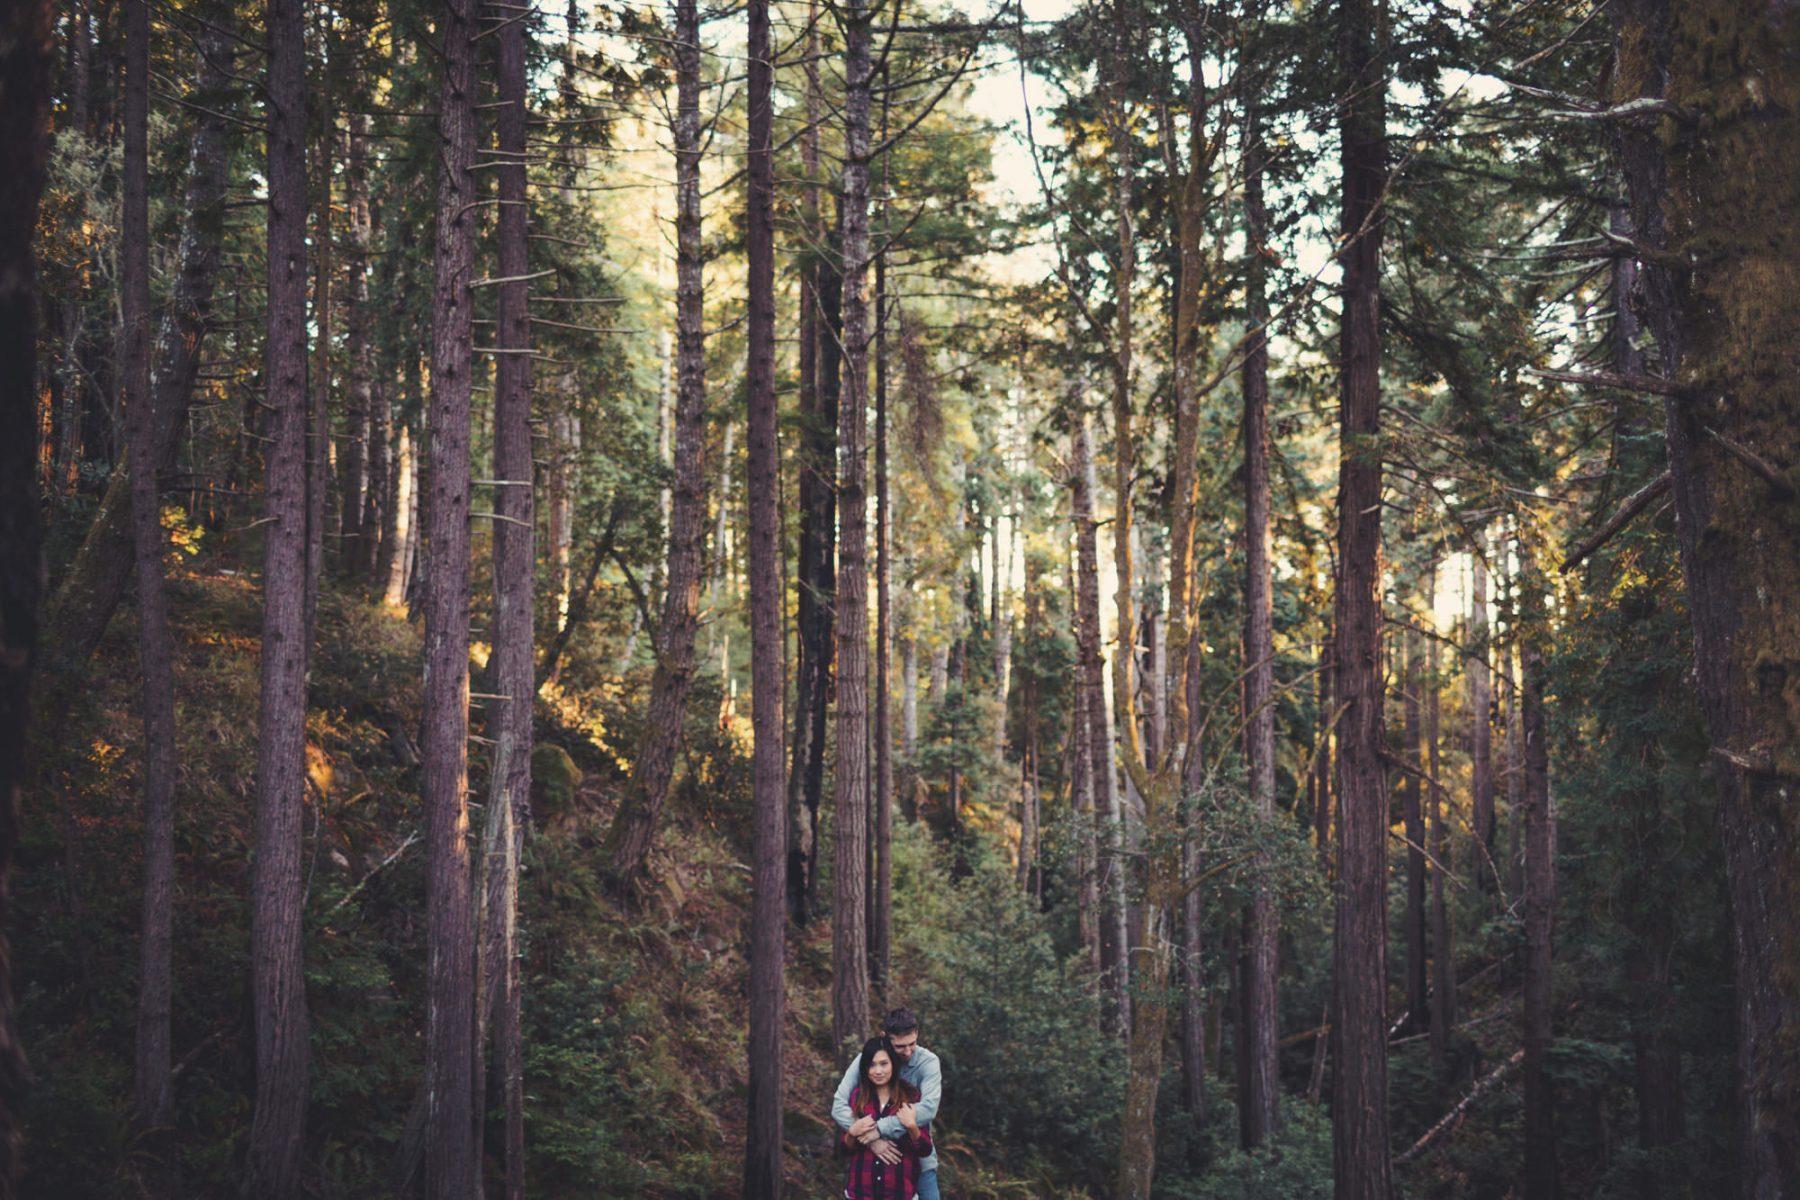 California-wedding-photographer-anne-claire-brun 75